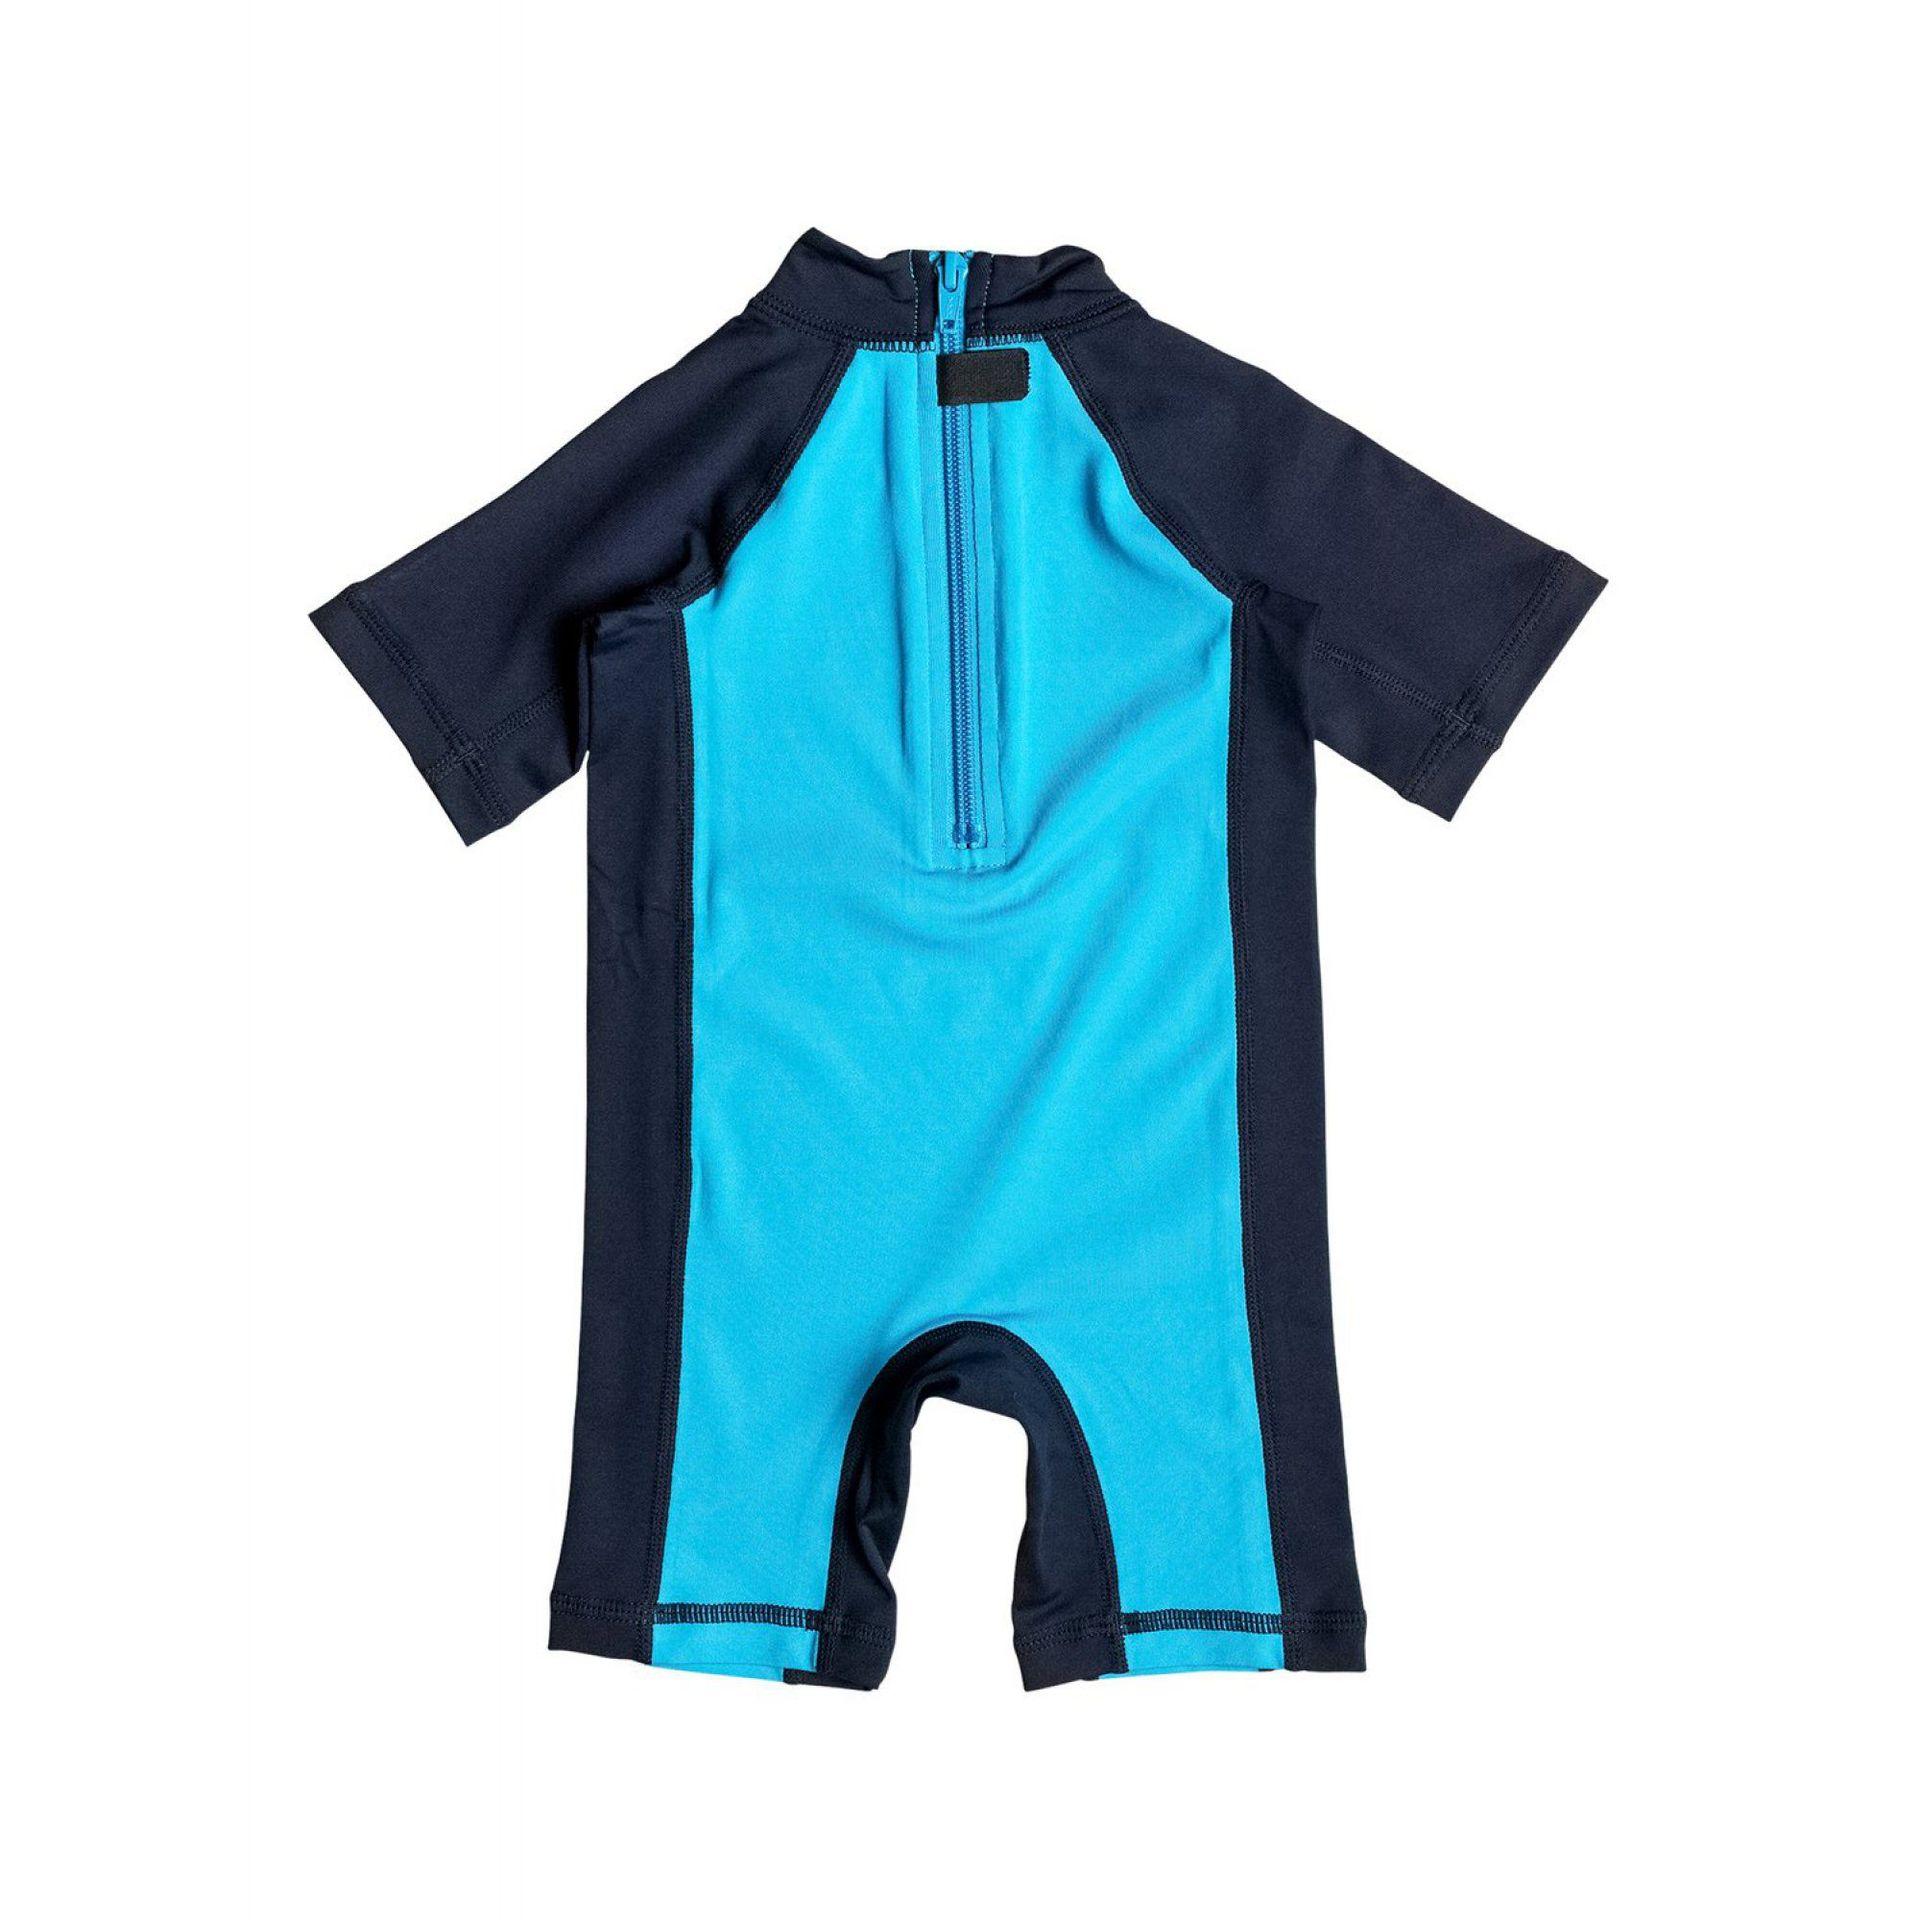 LYCRA QUIKSILVER BABY BUBBLE SPRINGSUIT BLUE DANUBE_NAVY BLAZER